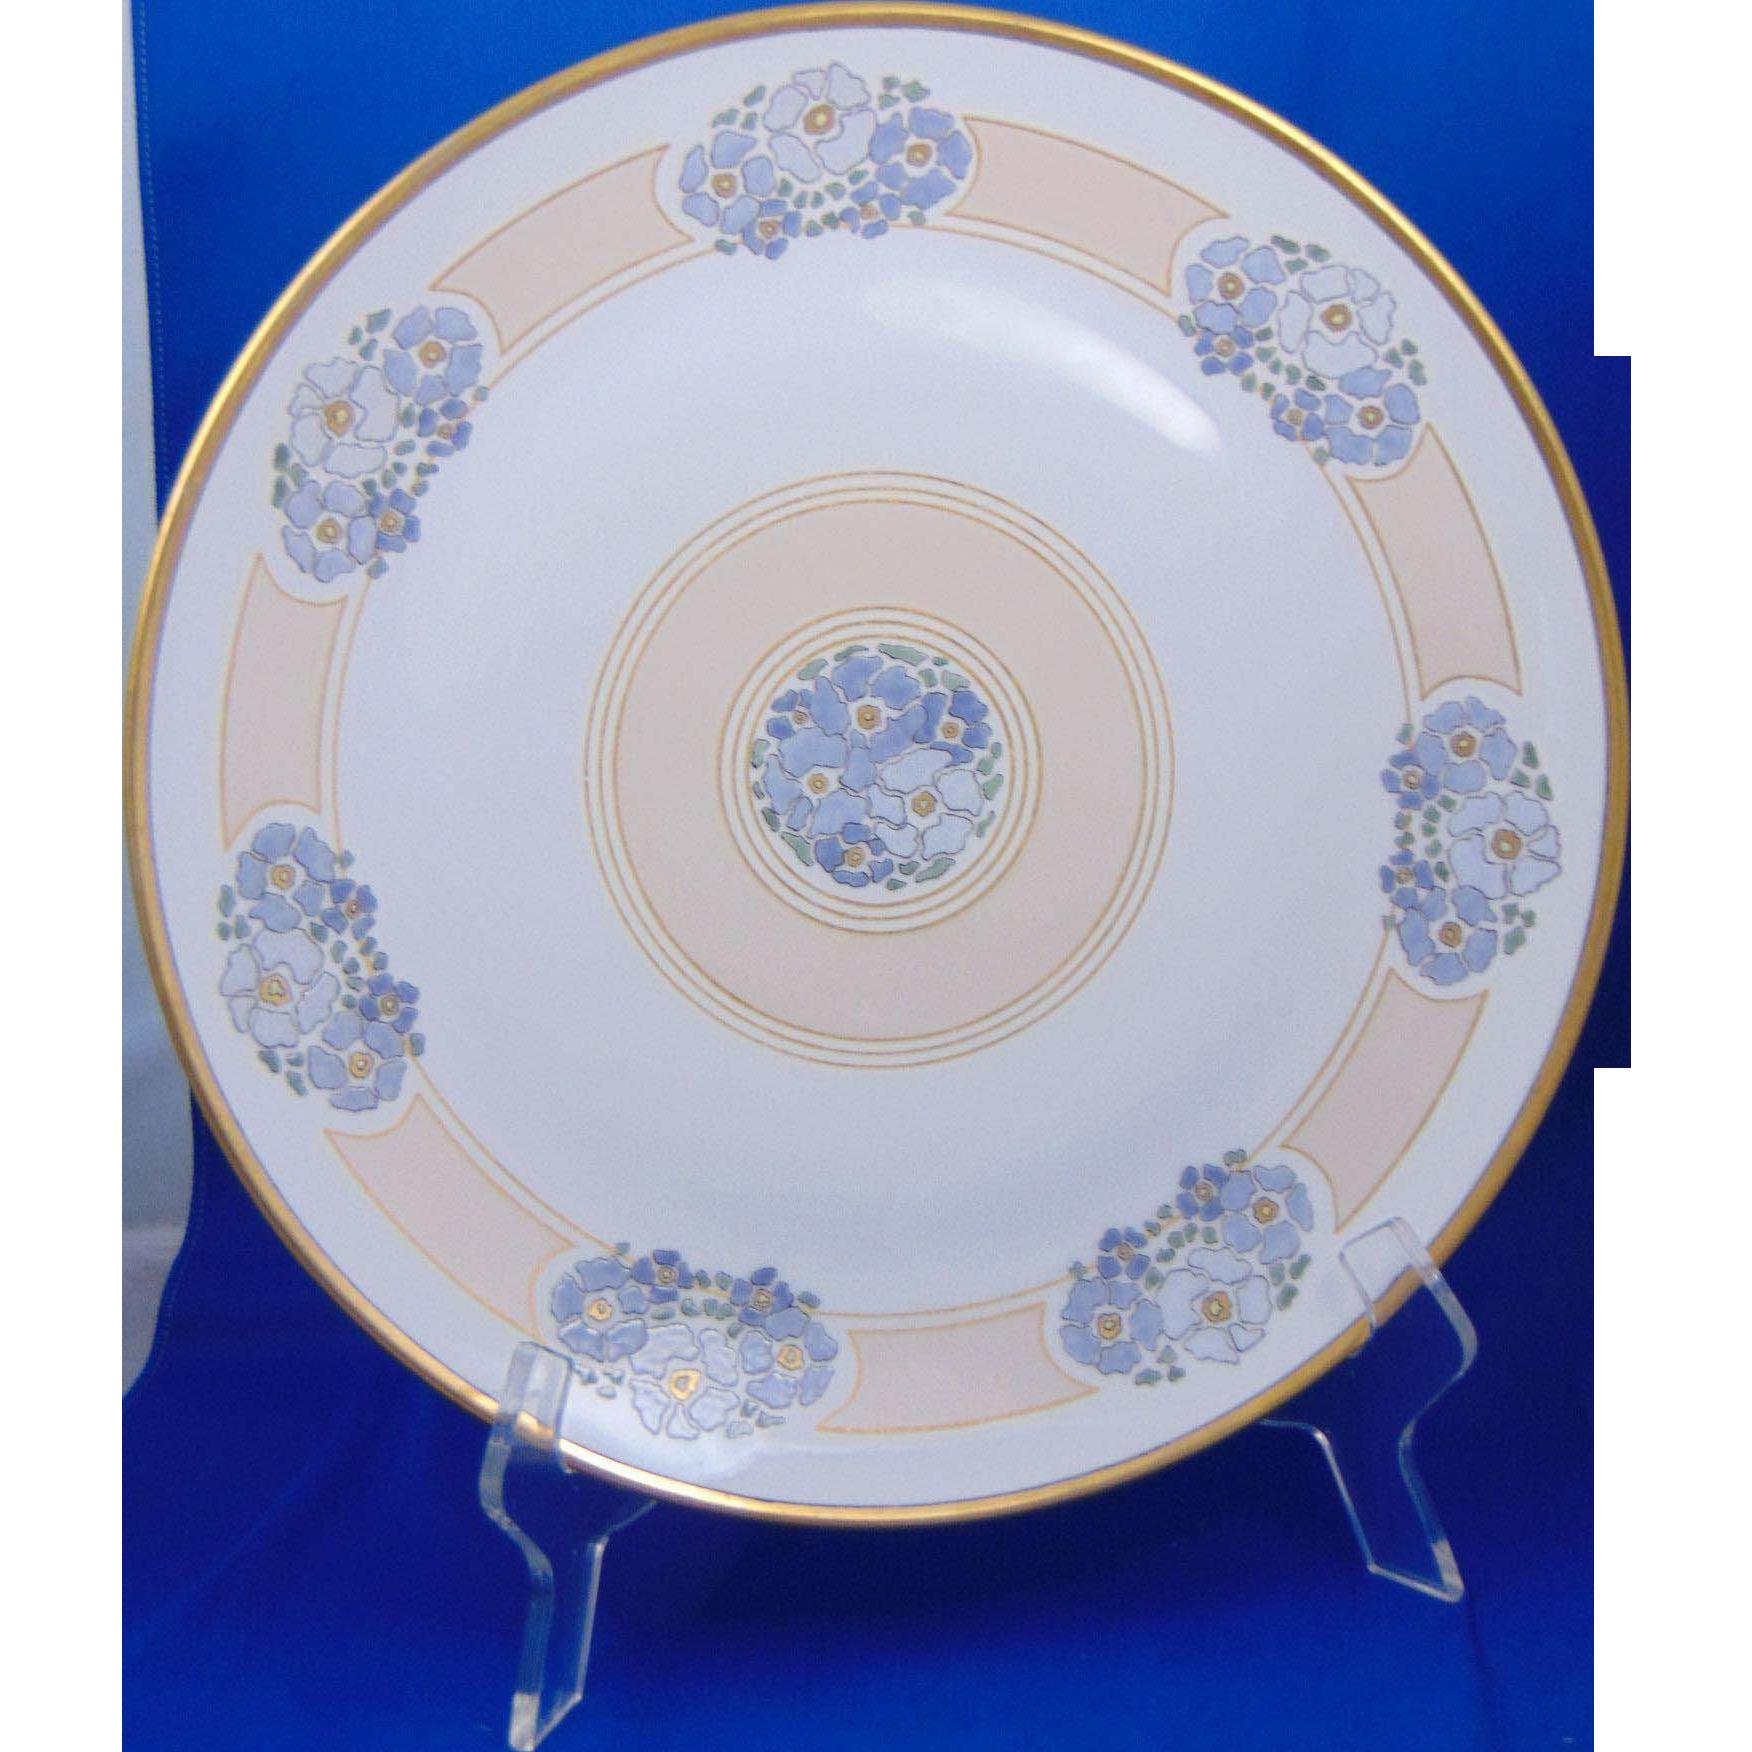 "Sommer & Matschak Schlaggenwald Austria Arts & Crafts Floral Motif Enameled Charger/Plate (Signed ""Fern Worrell""/Dated 1916)"